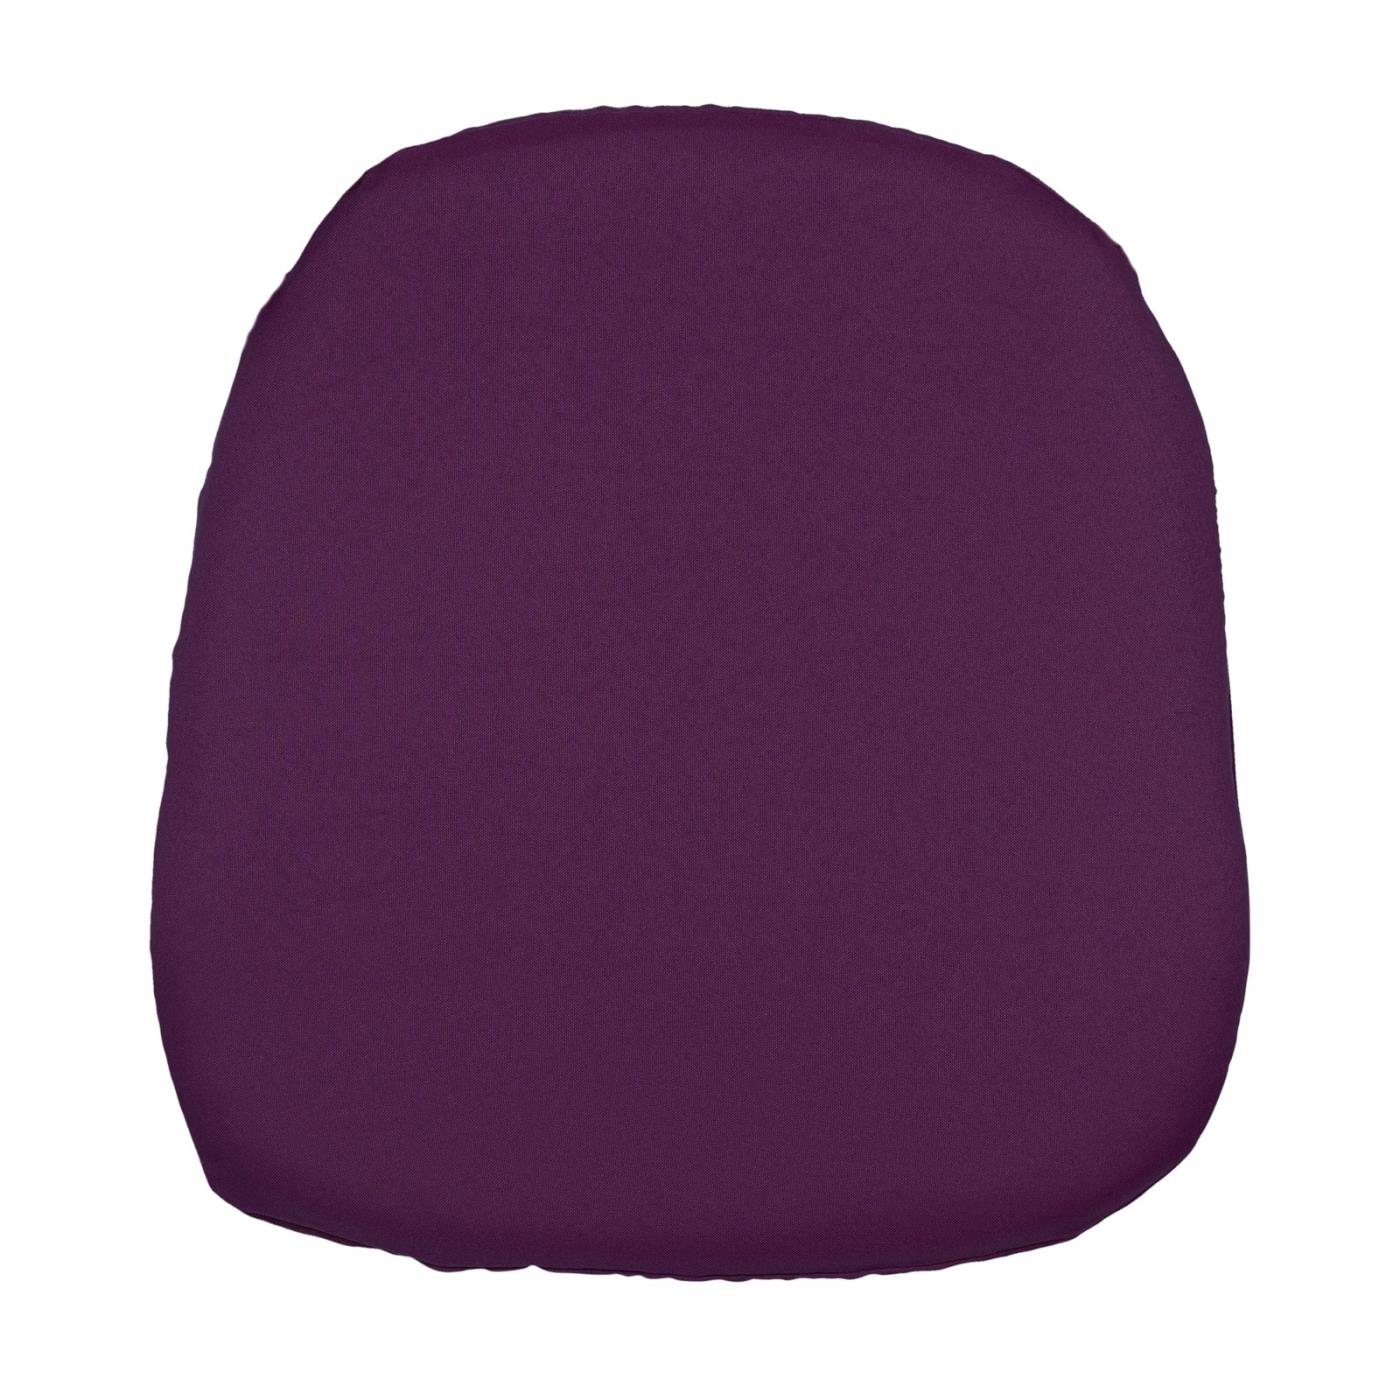 Poly Seat Cushion - Plum